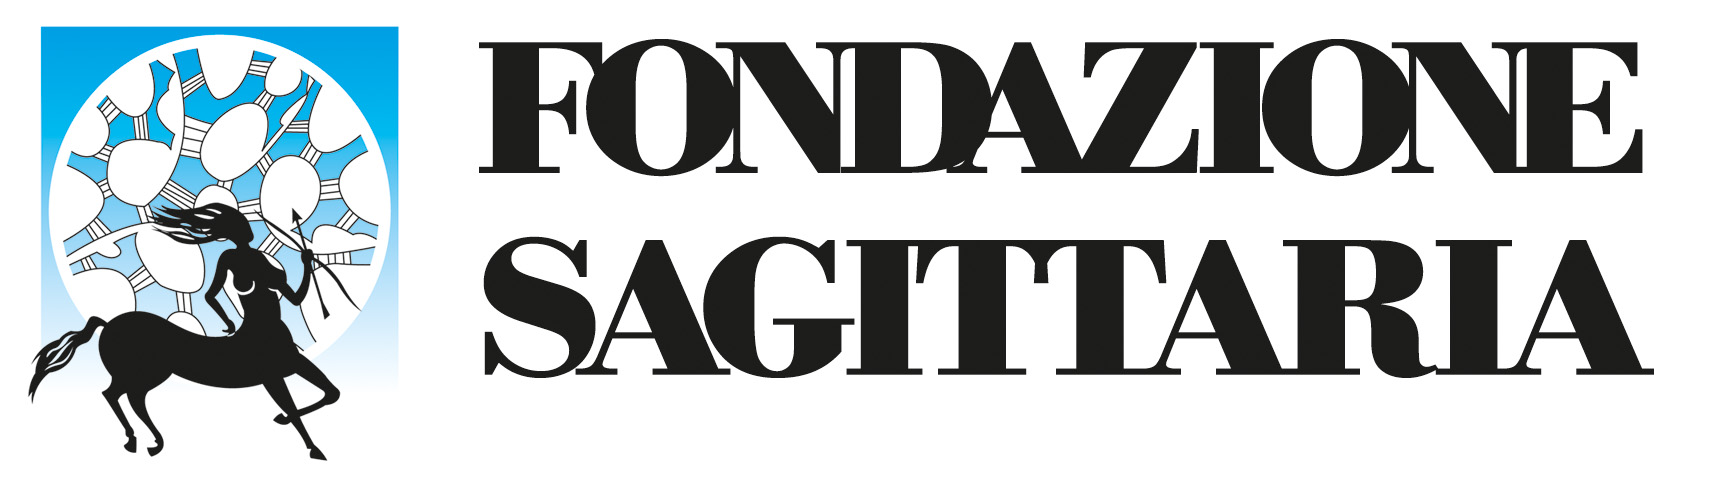 Fondazione Sagittaria